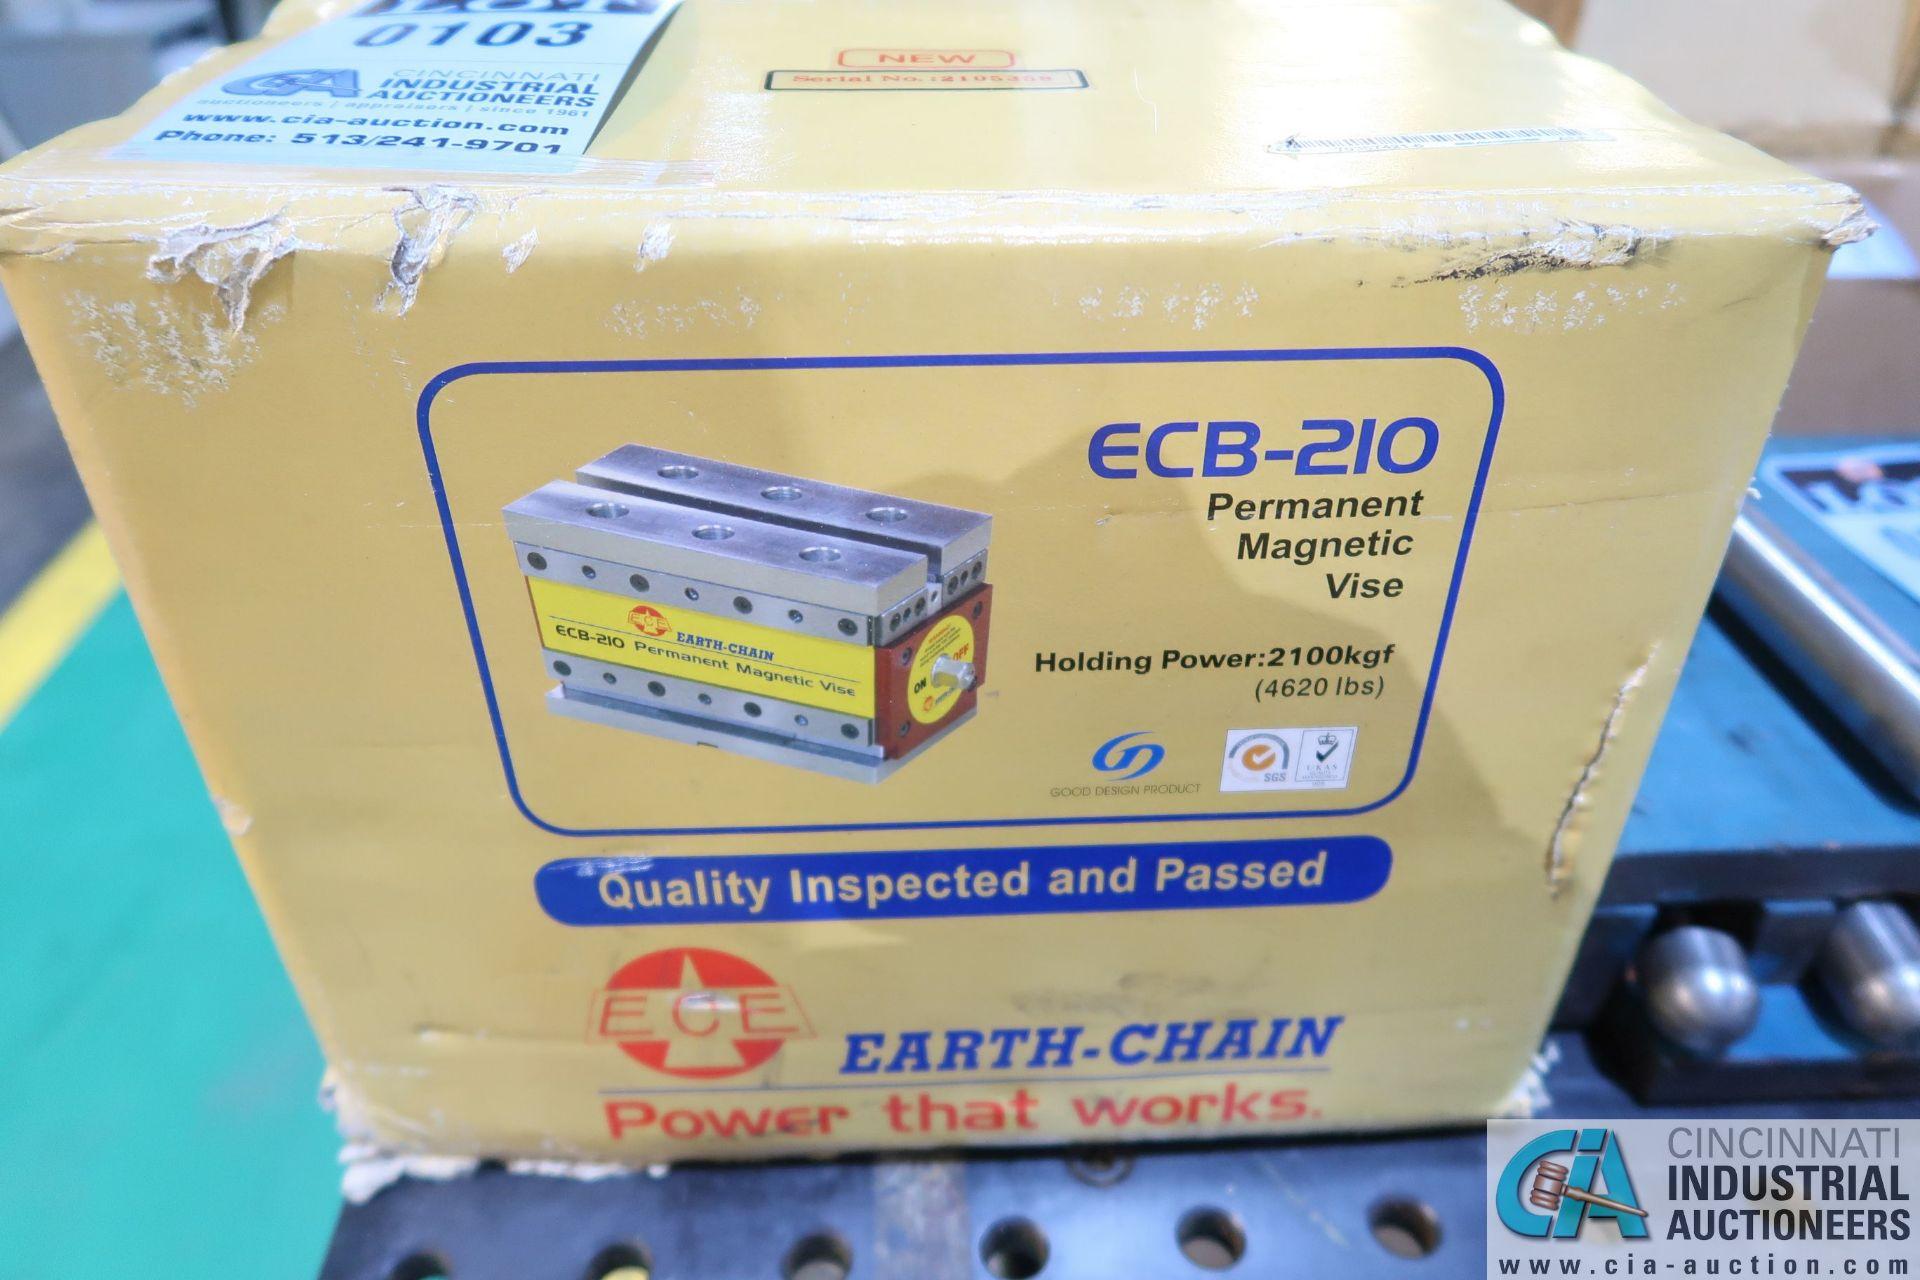 EARTH-CHAIN MODEL ECB-210 NEW PERMANENT MAGNETIC VISE; S/N 2105358, 4,620 LB HOLDING POWER